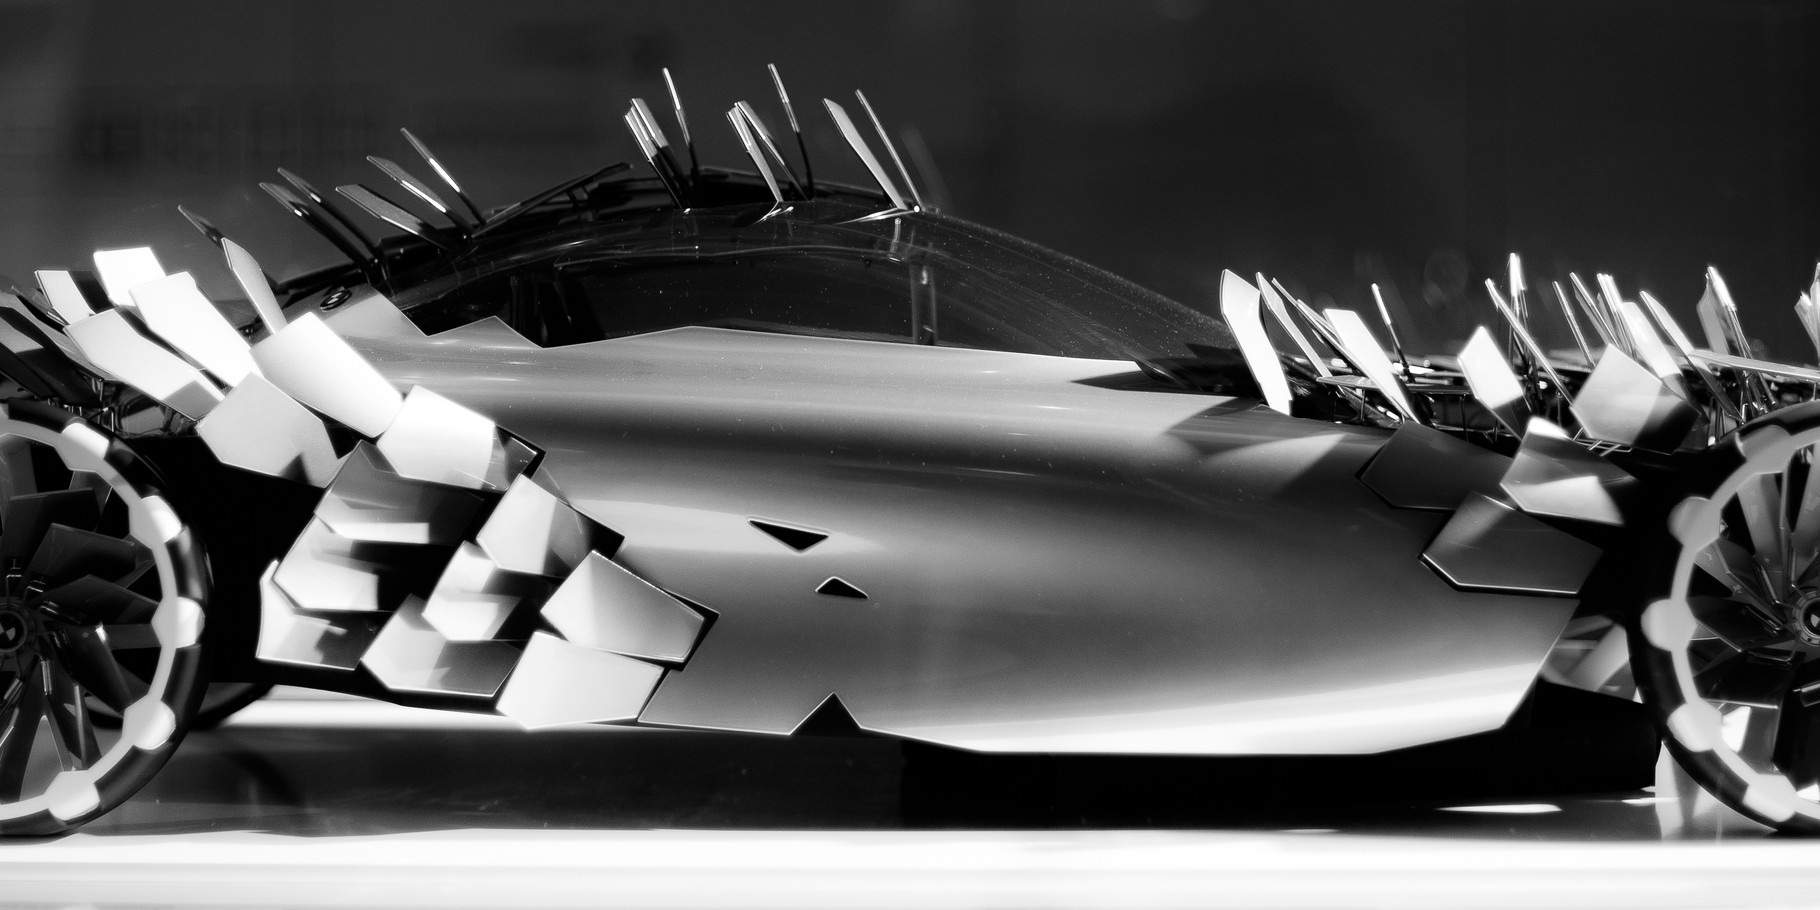 BMW Lovos; 60cm x 30cm; Fotodruck auf Acrylglas; Auflage 12